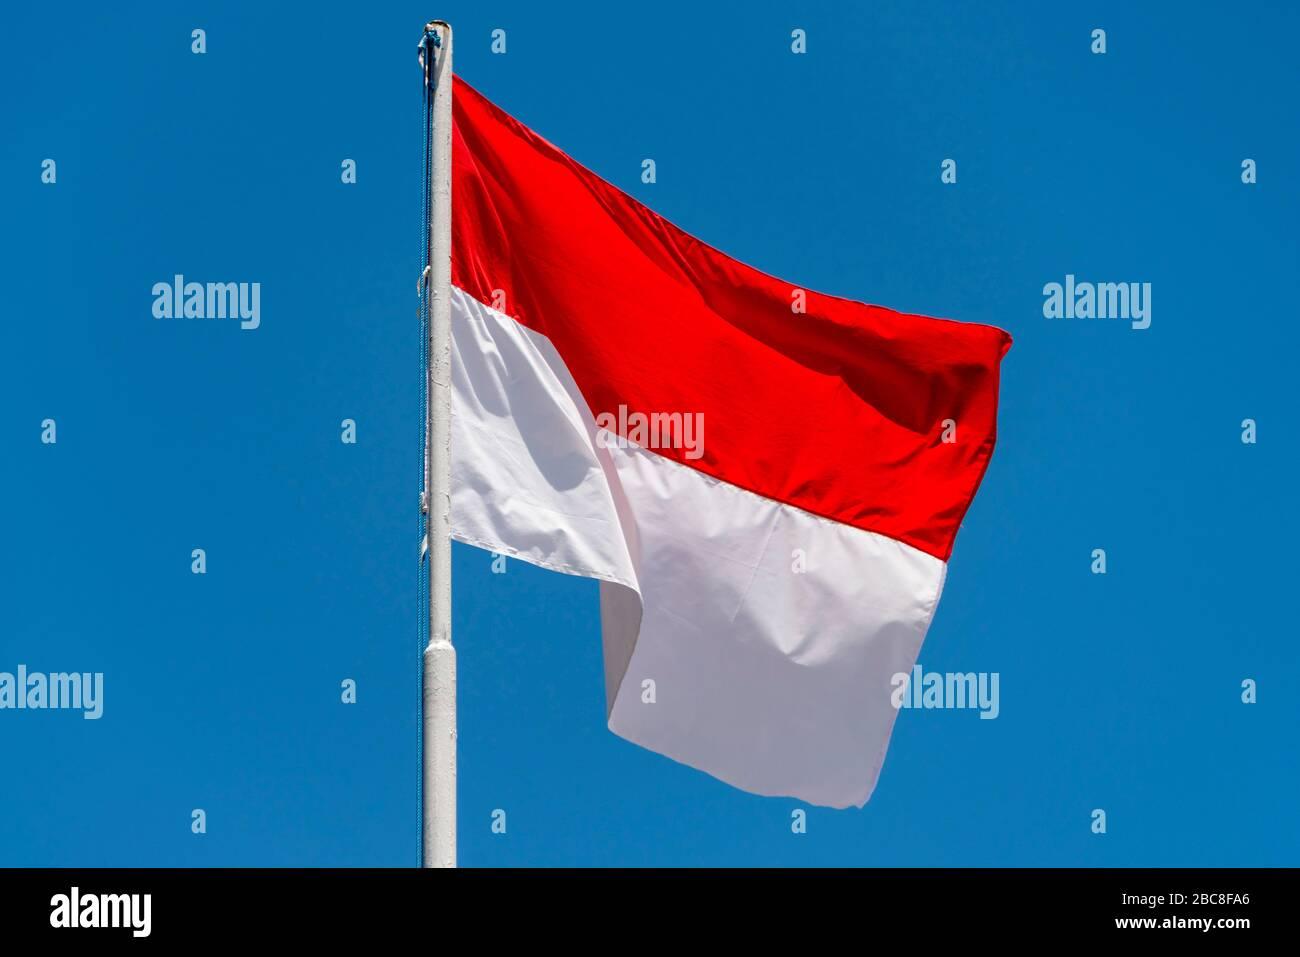 Bendera Merah Putih High Resolution Stock Photography And Images Alamy